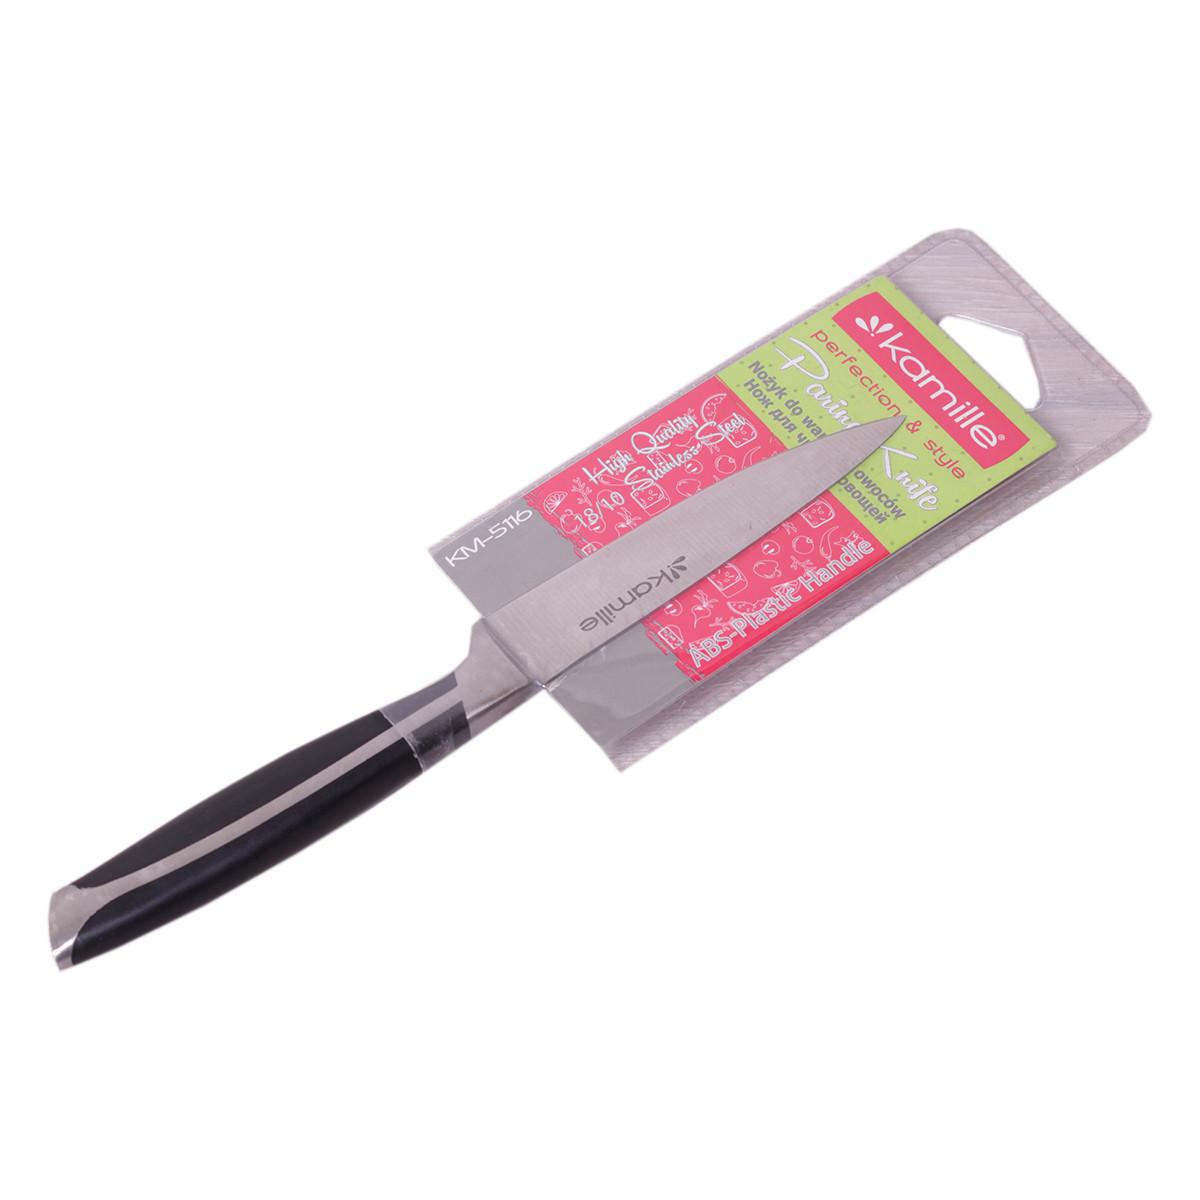 Нож кухонный Kamille для чистки овощей с ручкой из ABS-пластика